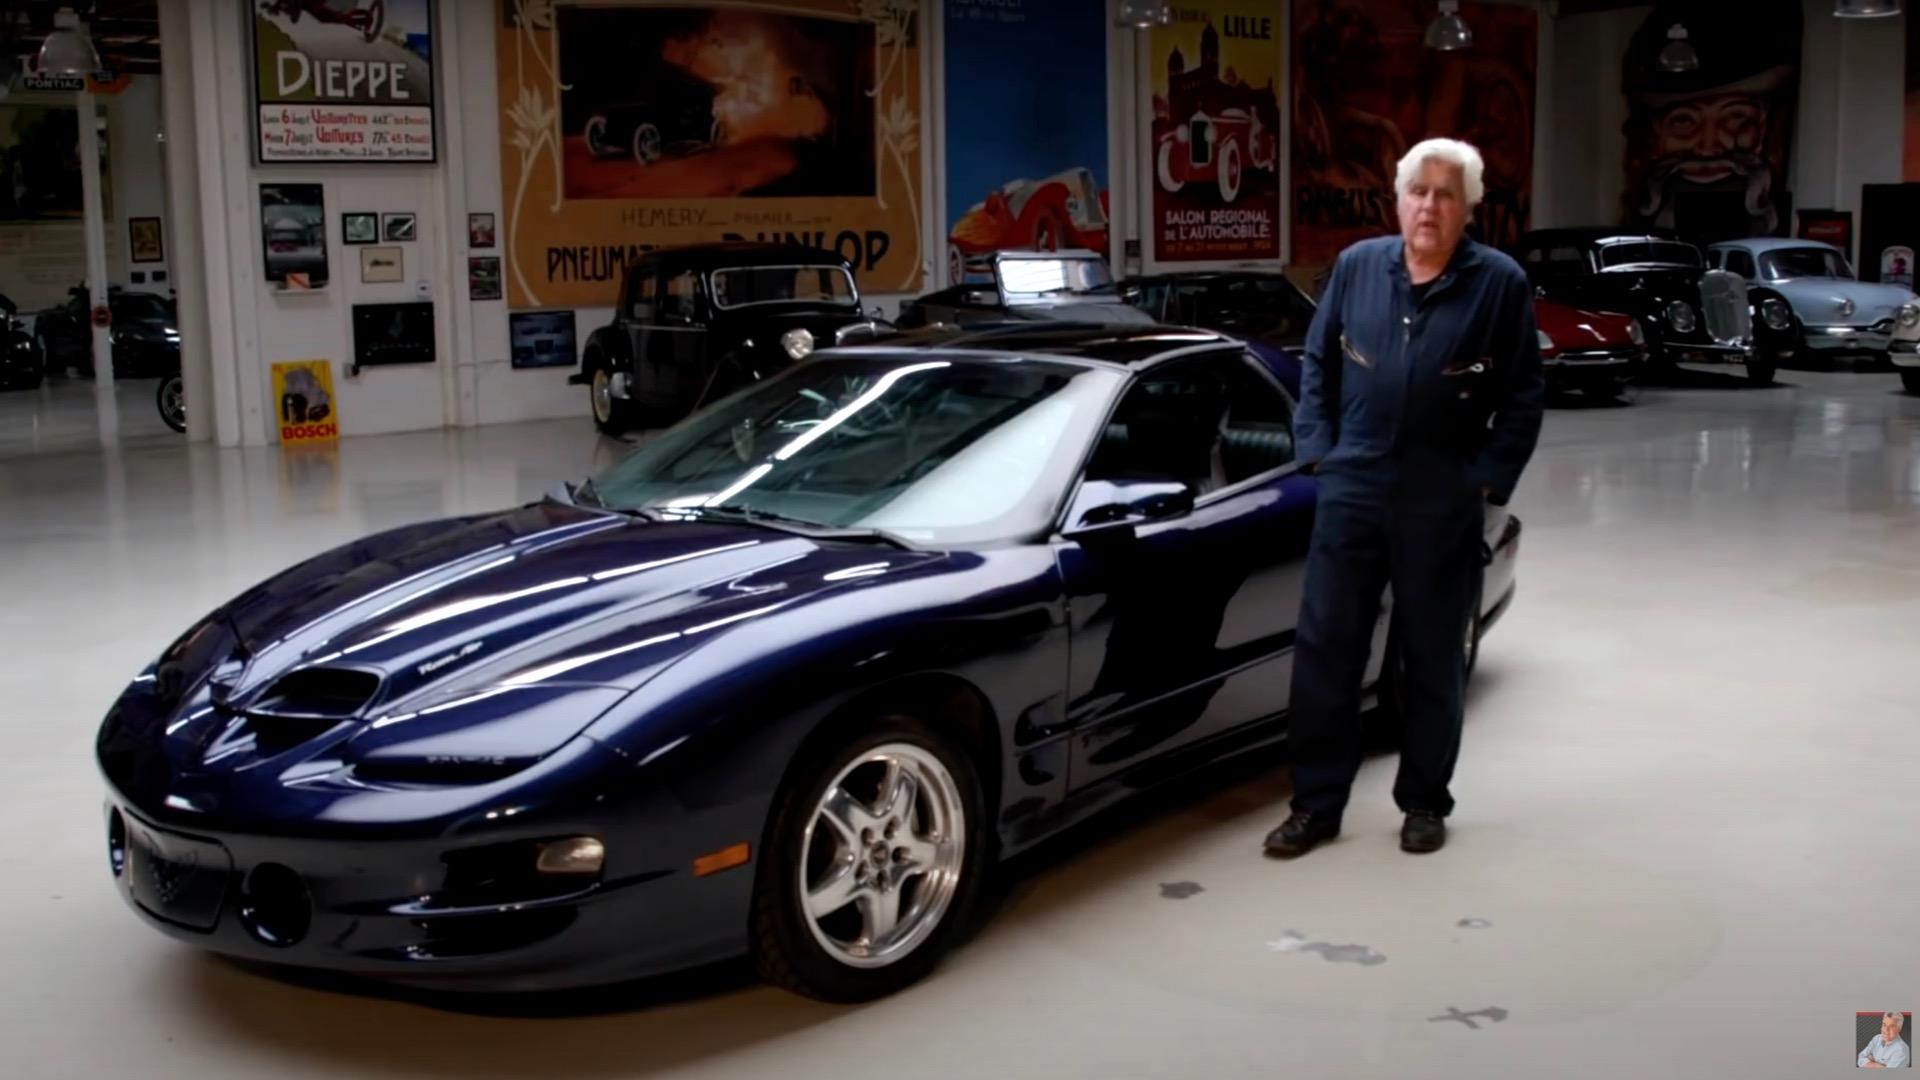 Jay Leno explains why the 2002 Pontiac Firebird is an overlooked gem